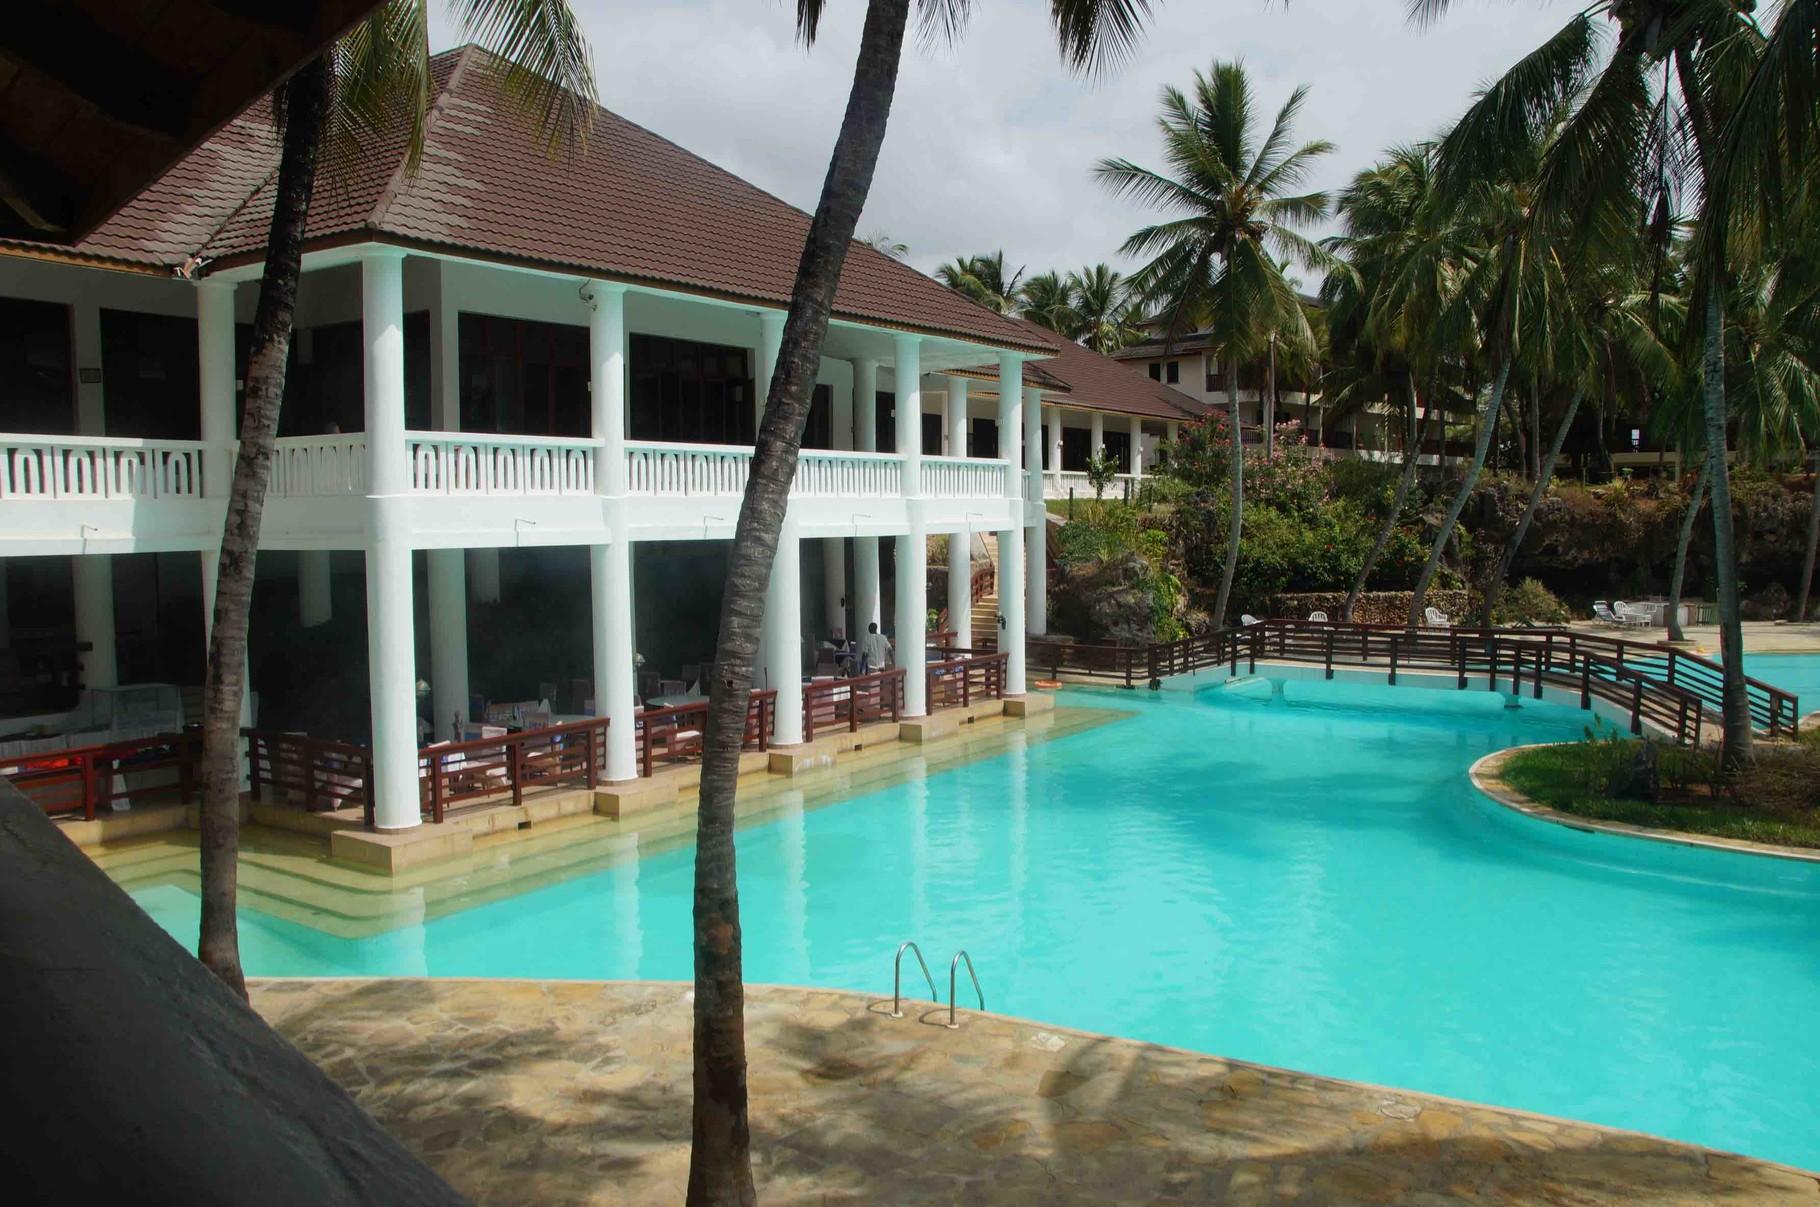 unser Hotel in Mombasa